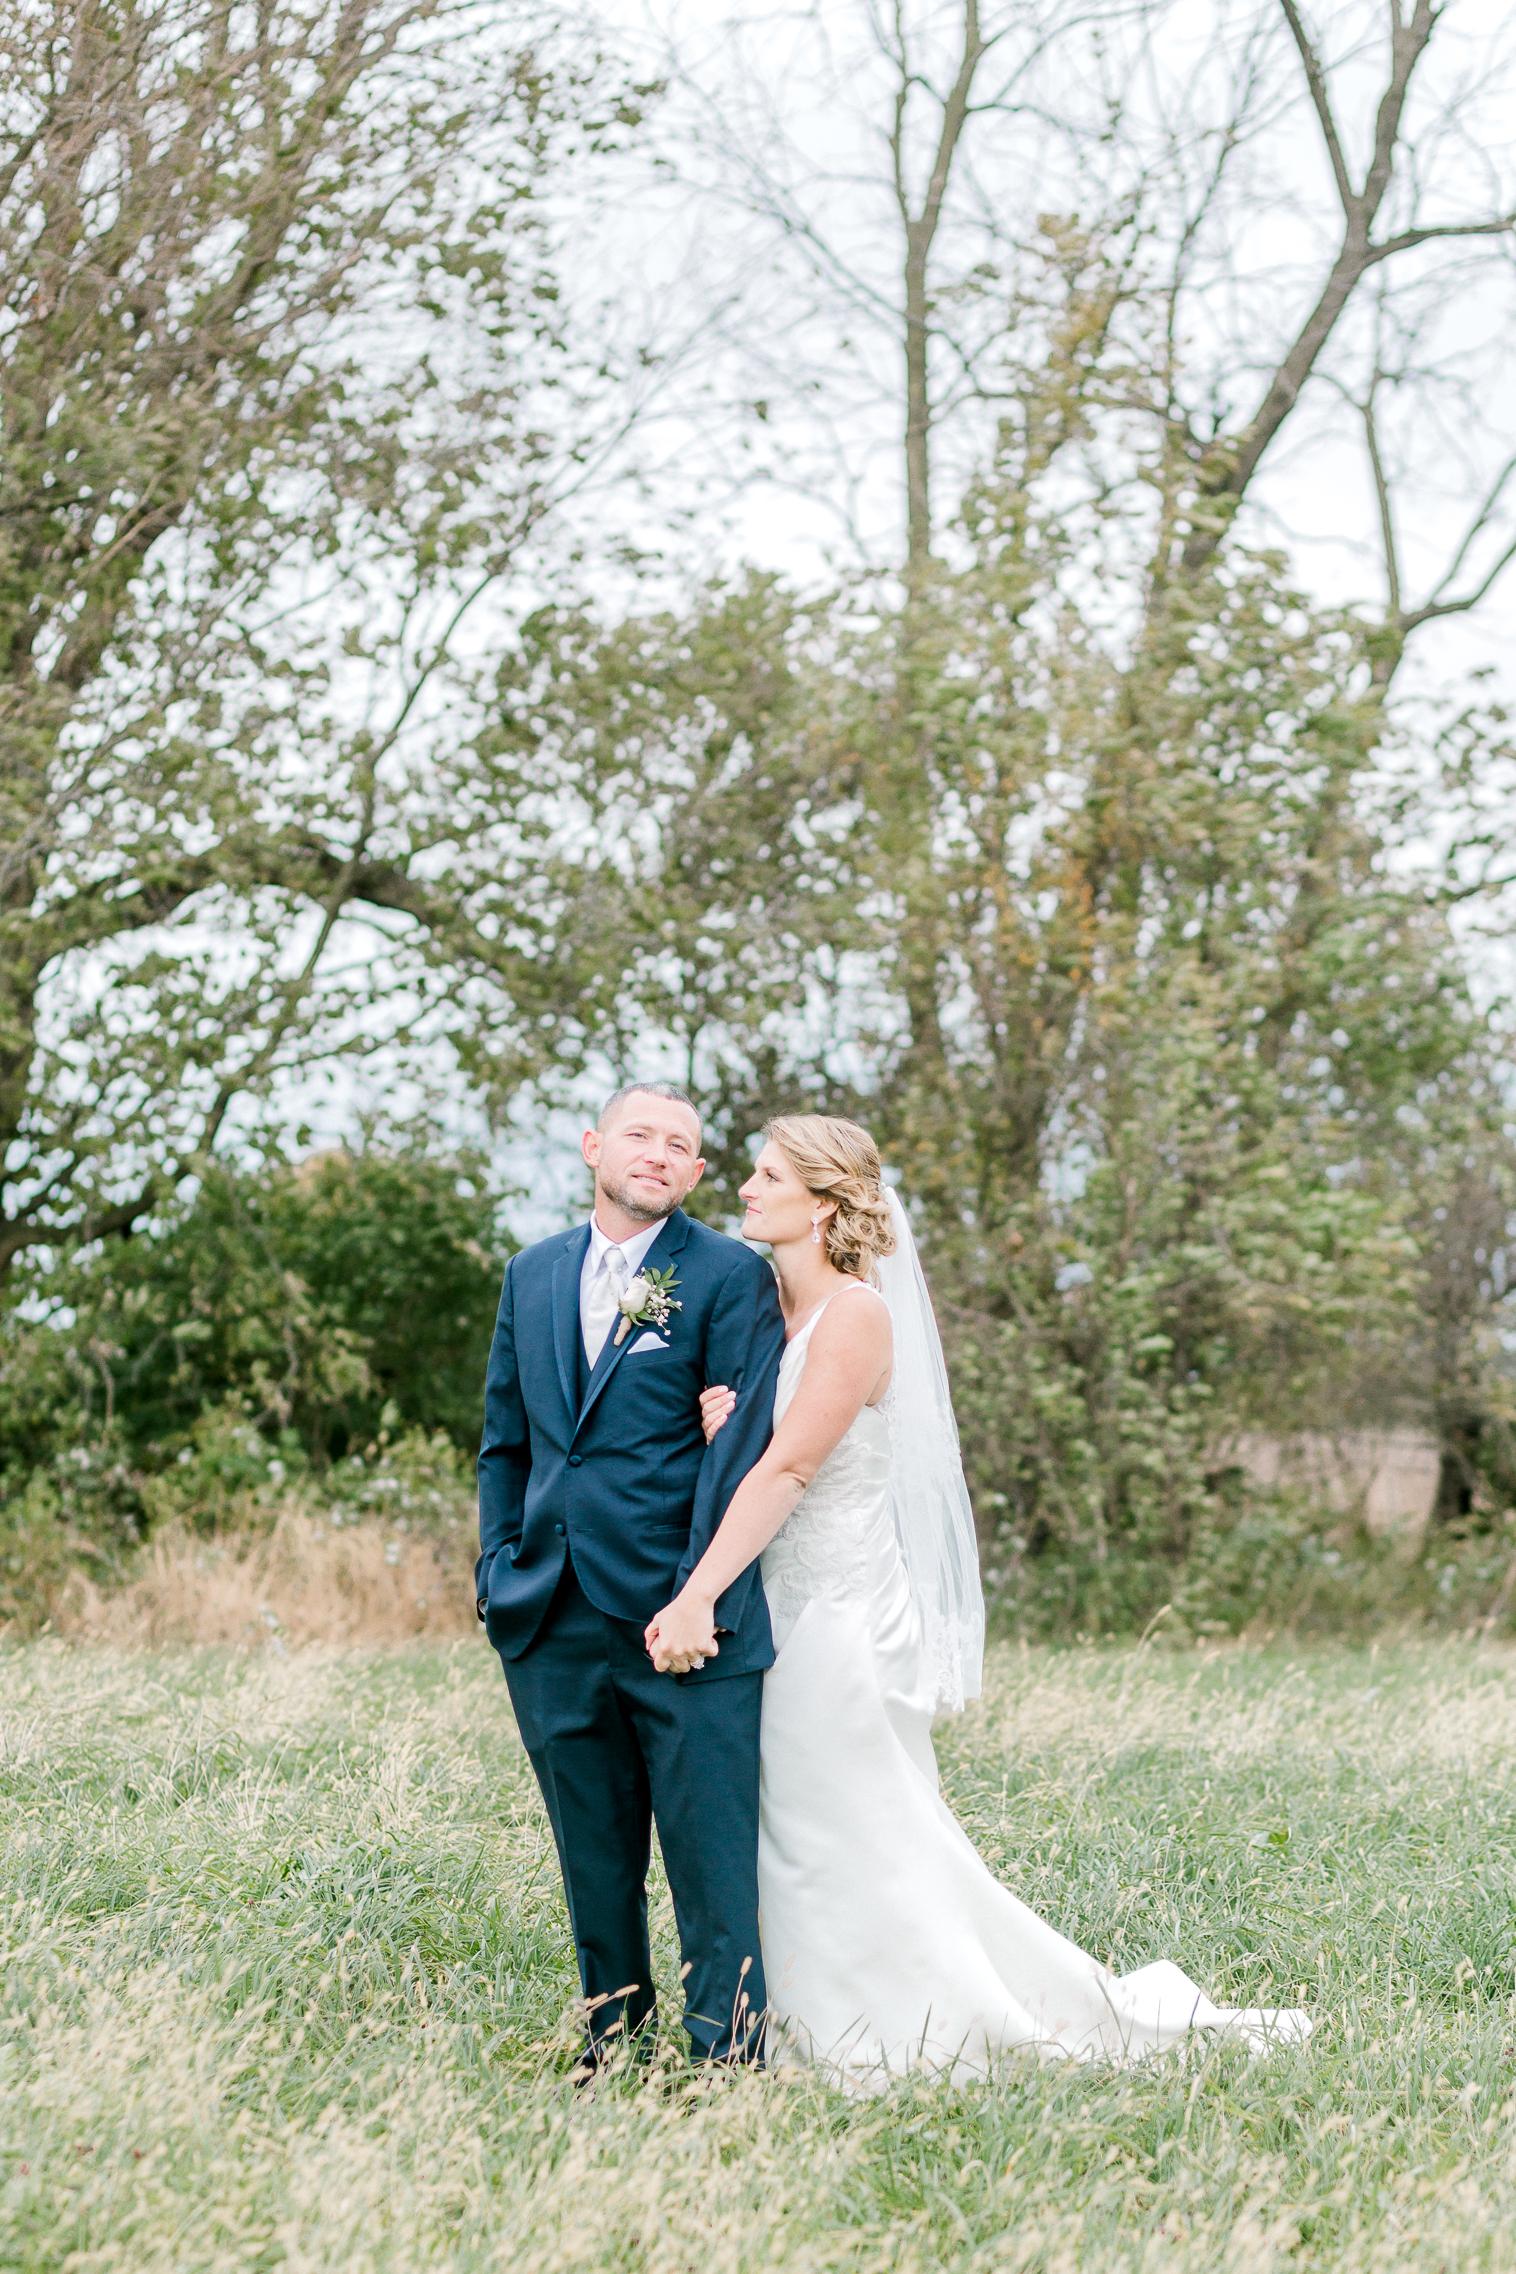 Pennsylvania October Fall Lehigh Valley wedding and lifestyle photographer Lytle Photo Co (96 of 167).jpg